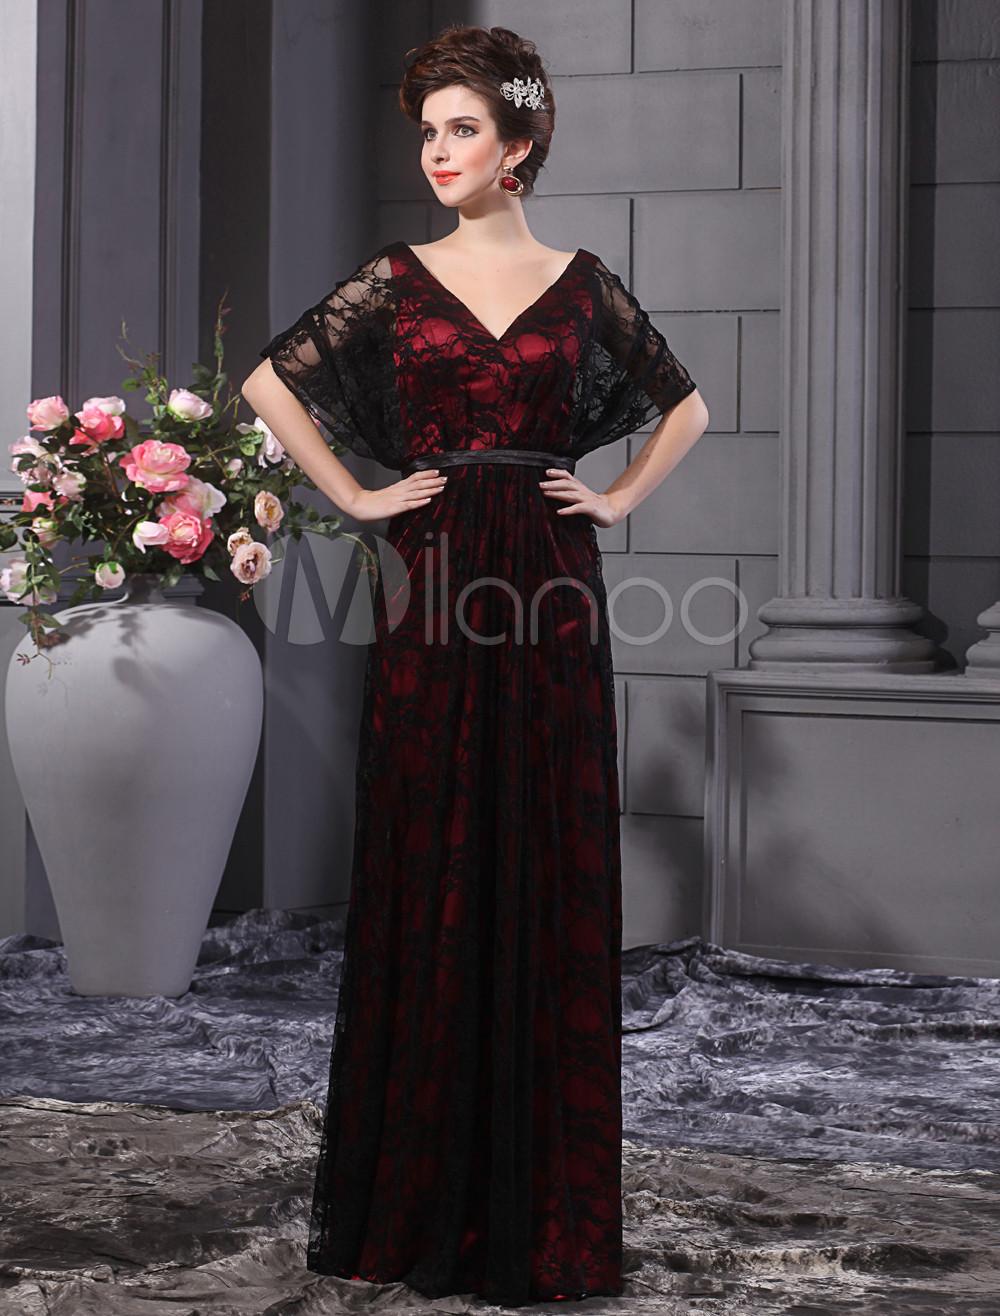 Elegant Black Lace V-Neck Evening Dress Milanoo